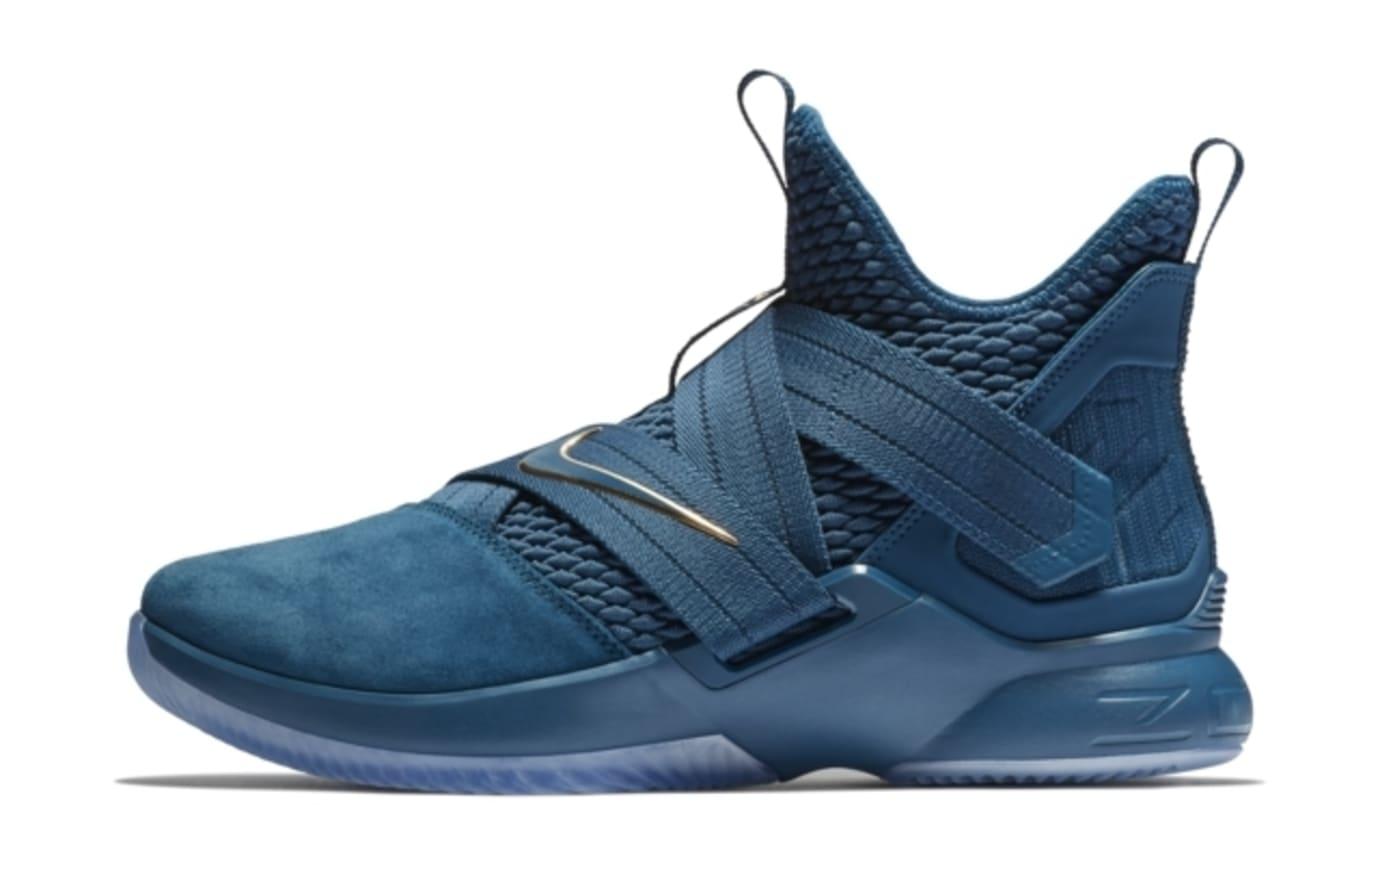 Nike LeBron Soldier 12  Agimat  AO4054-500 Release Date  e913230f4